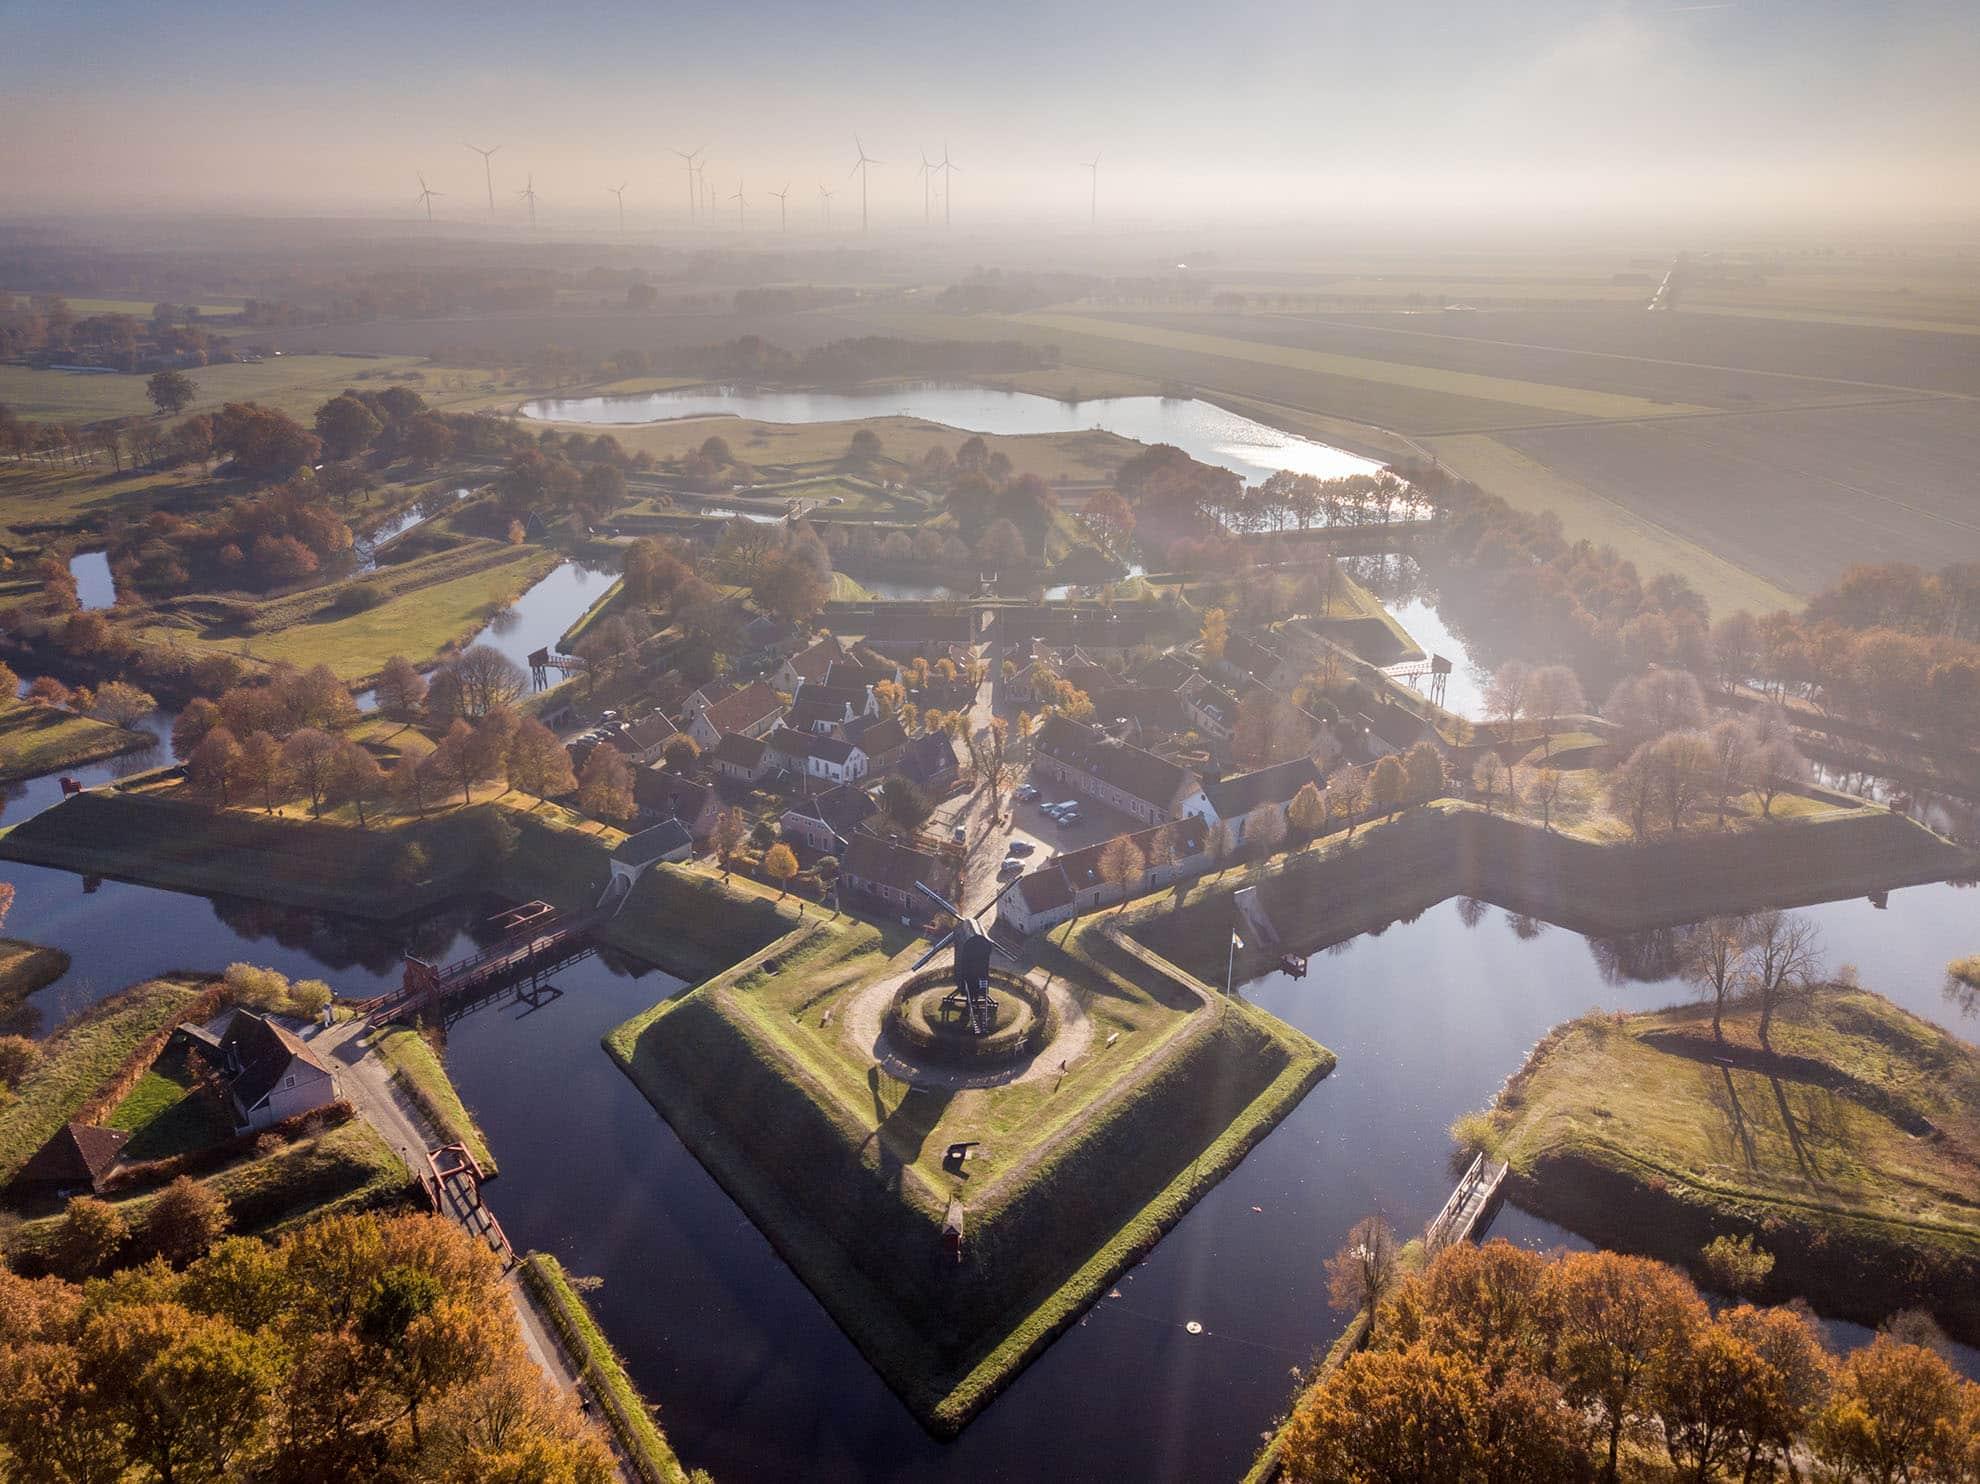 Familotel Gut Landegge Umgebung Ausflüge Festung Bourtange Niederlande